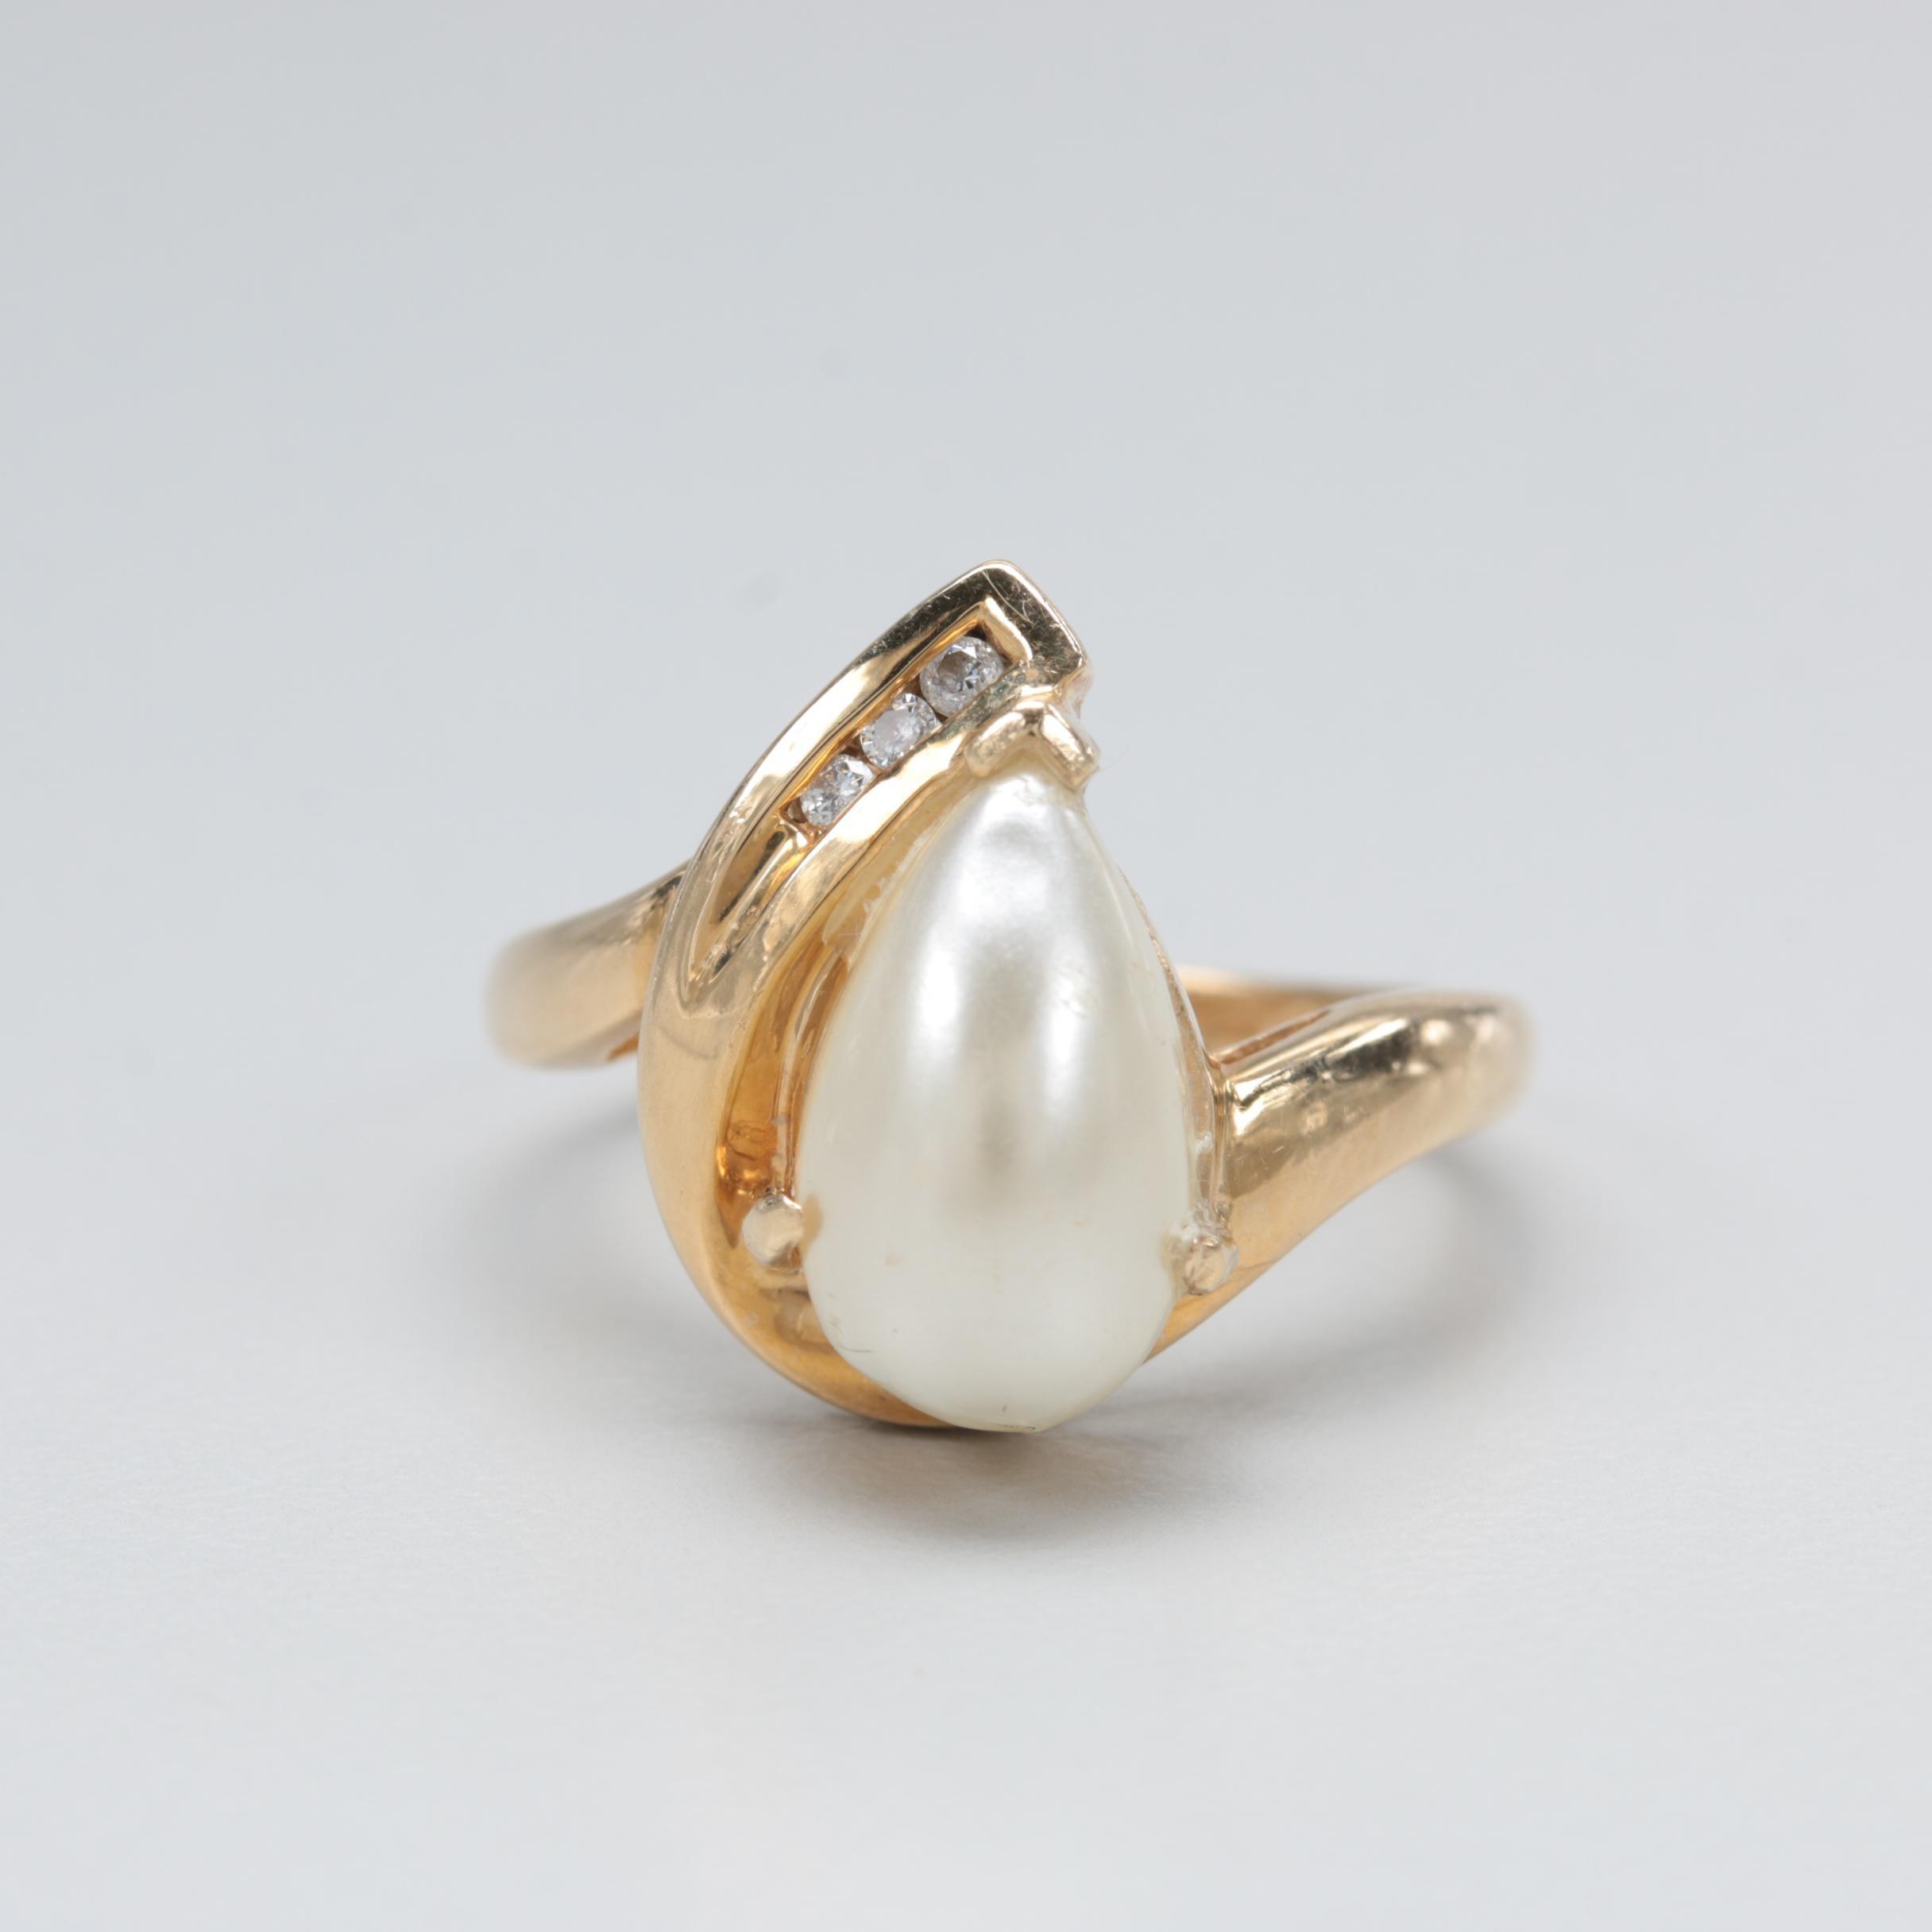 14K Yellow Gold Diamond and Imitation Pearl Ring